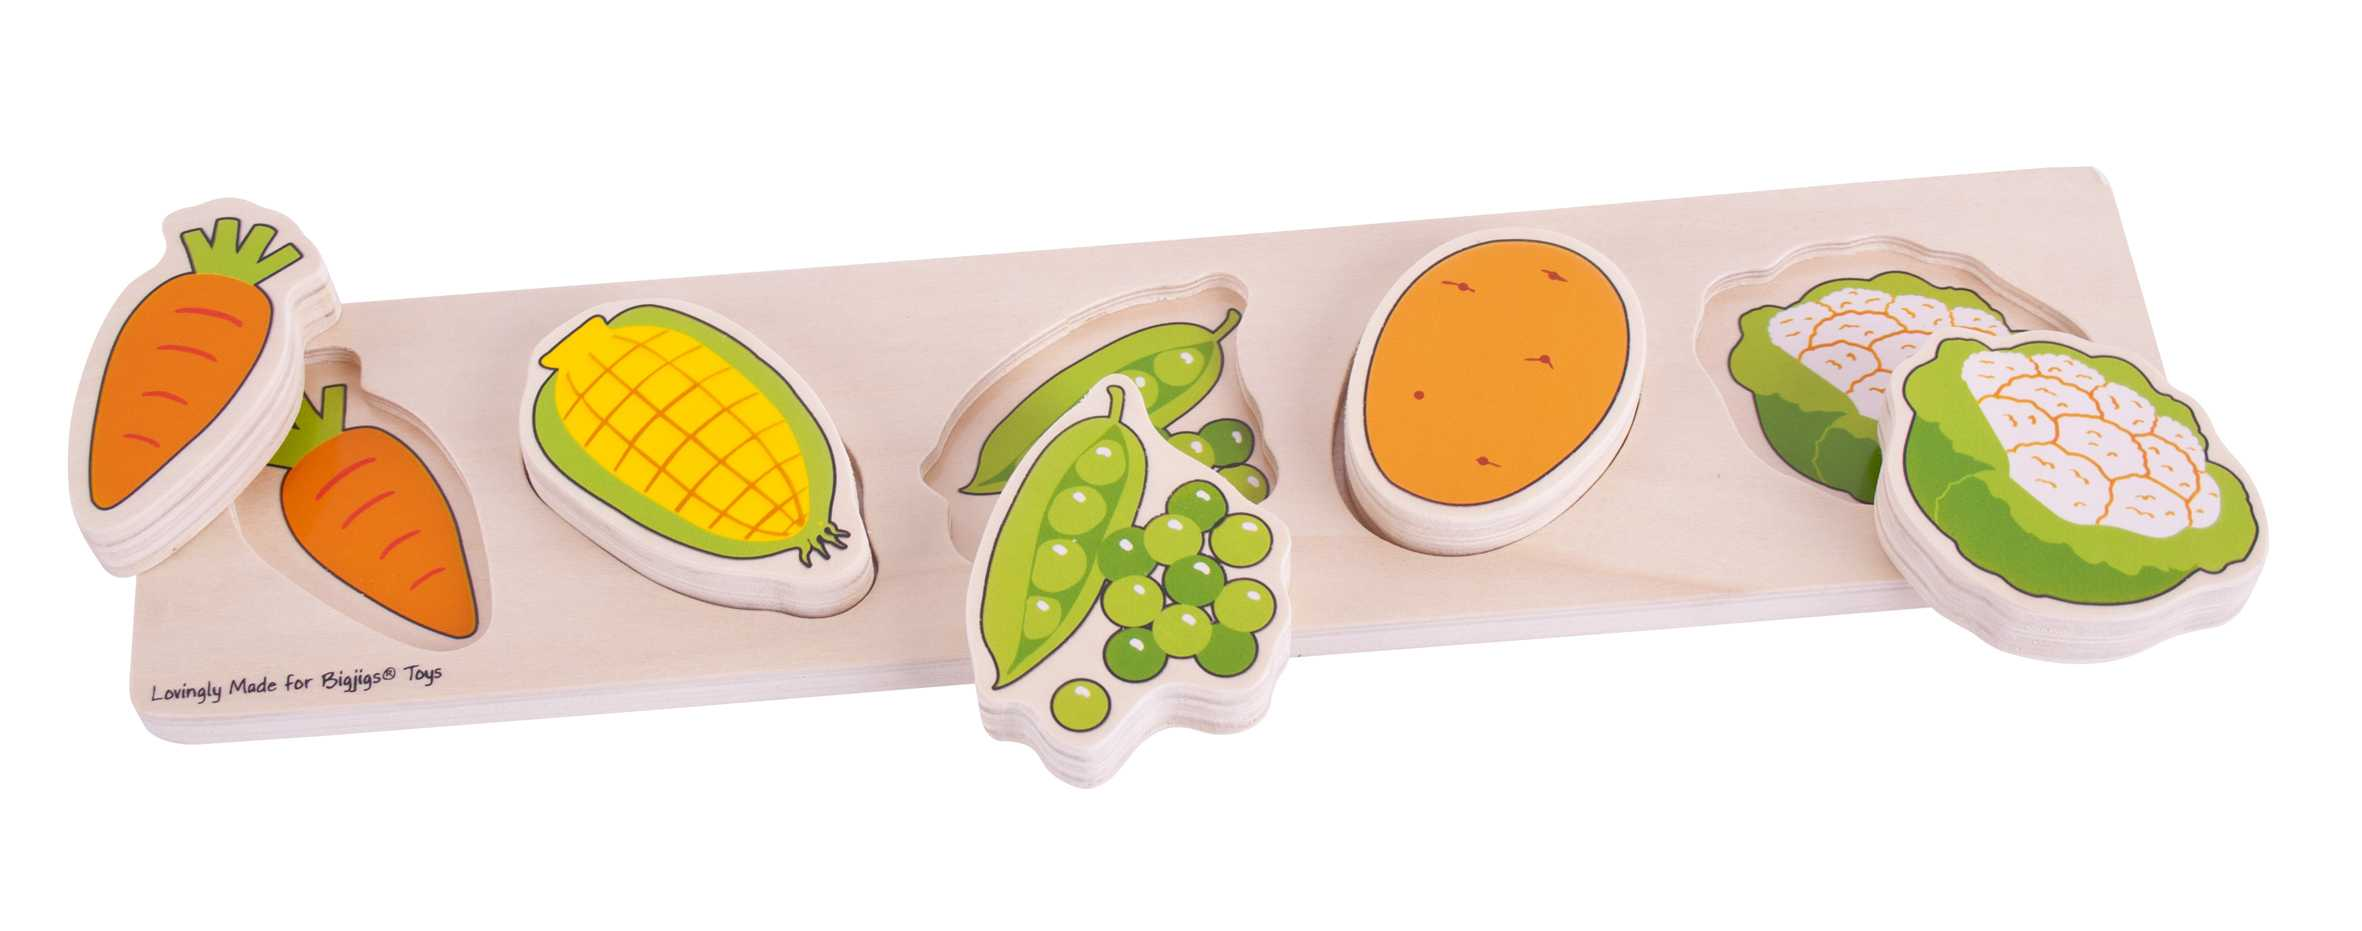 Chunky Lift & Match Vegetales